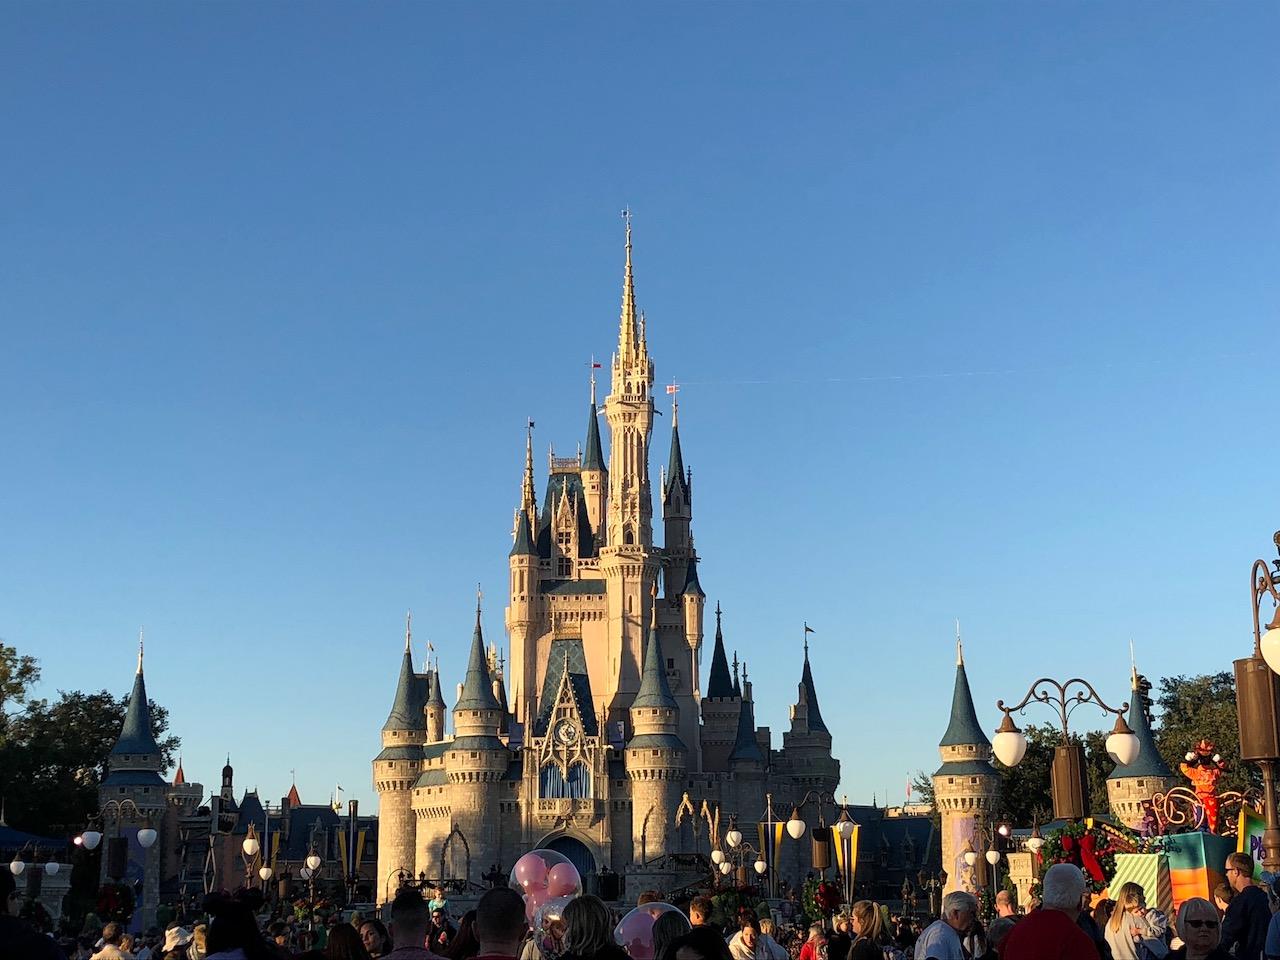 Free Disney Dining Walt Disney World Resort